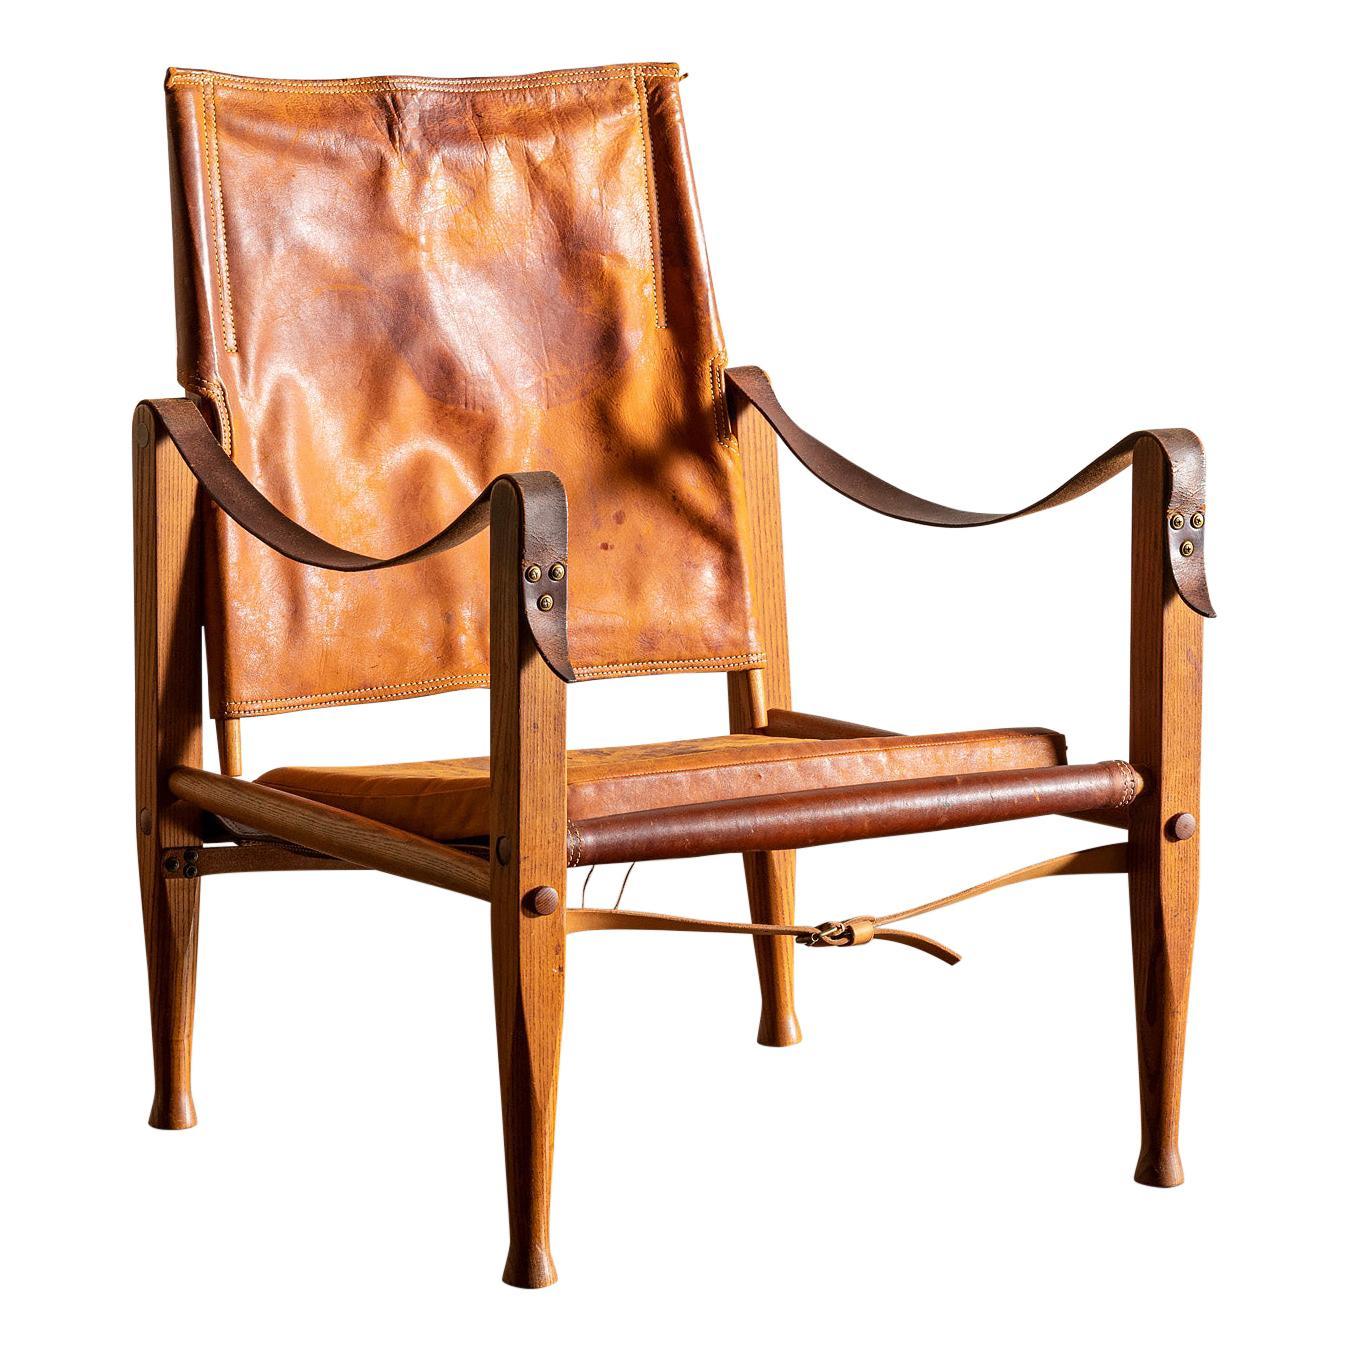 Safari Chair by Kaare Klint in Cognac Leather, Denmark, 1960s